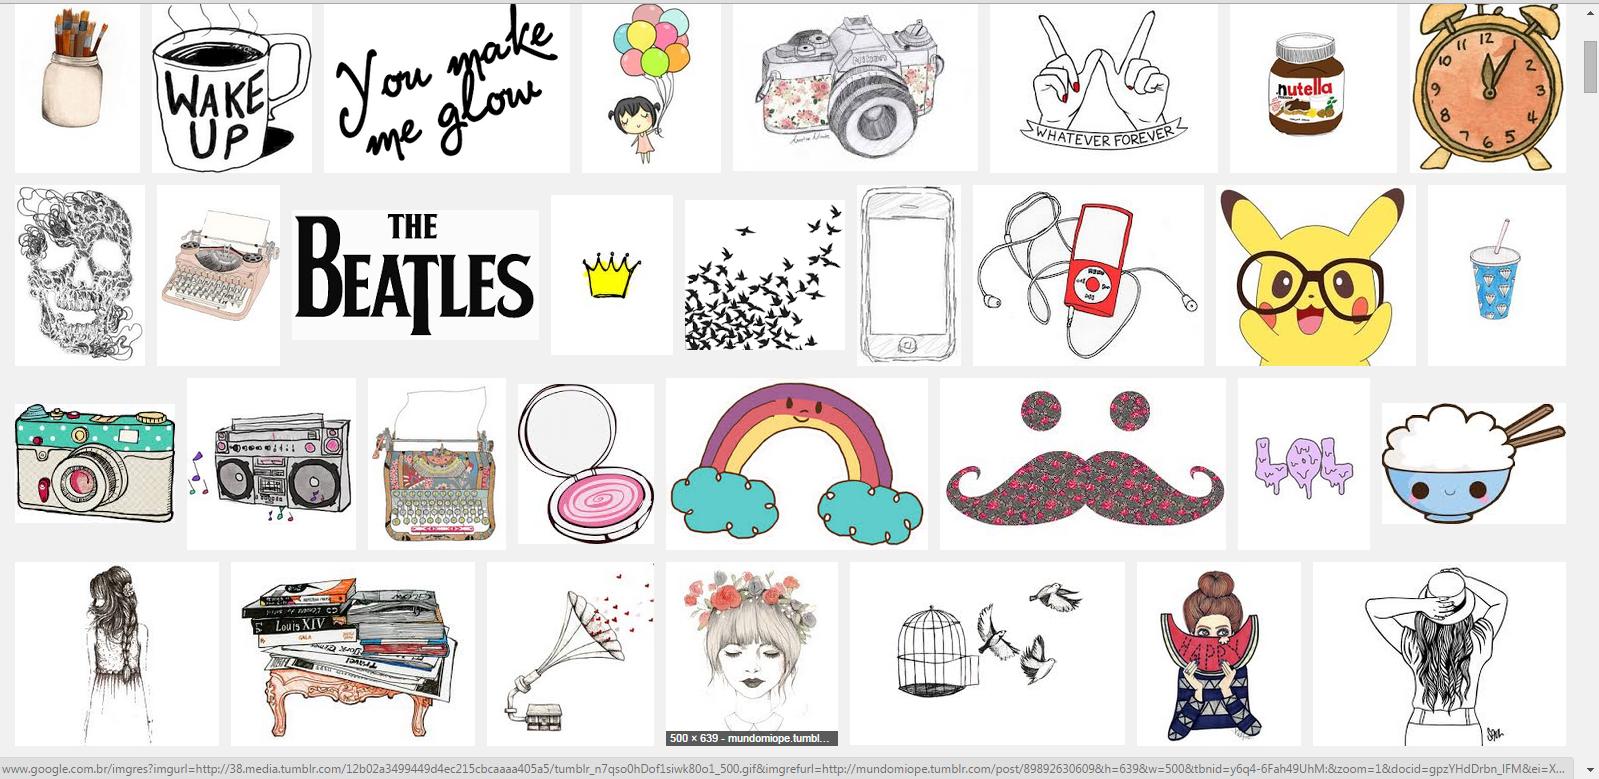 Fashion Teen: Como Fazer Montagem Tumblr Pelo Word